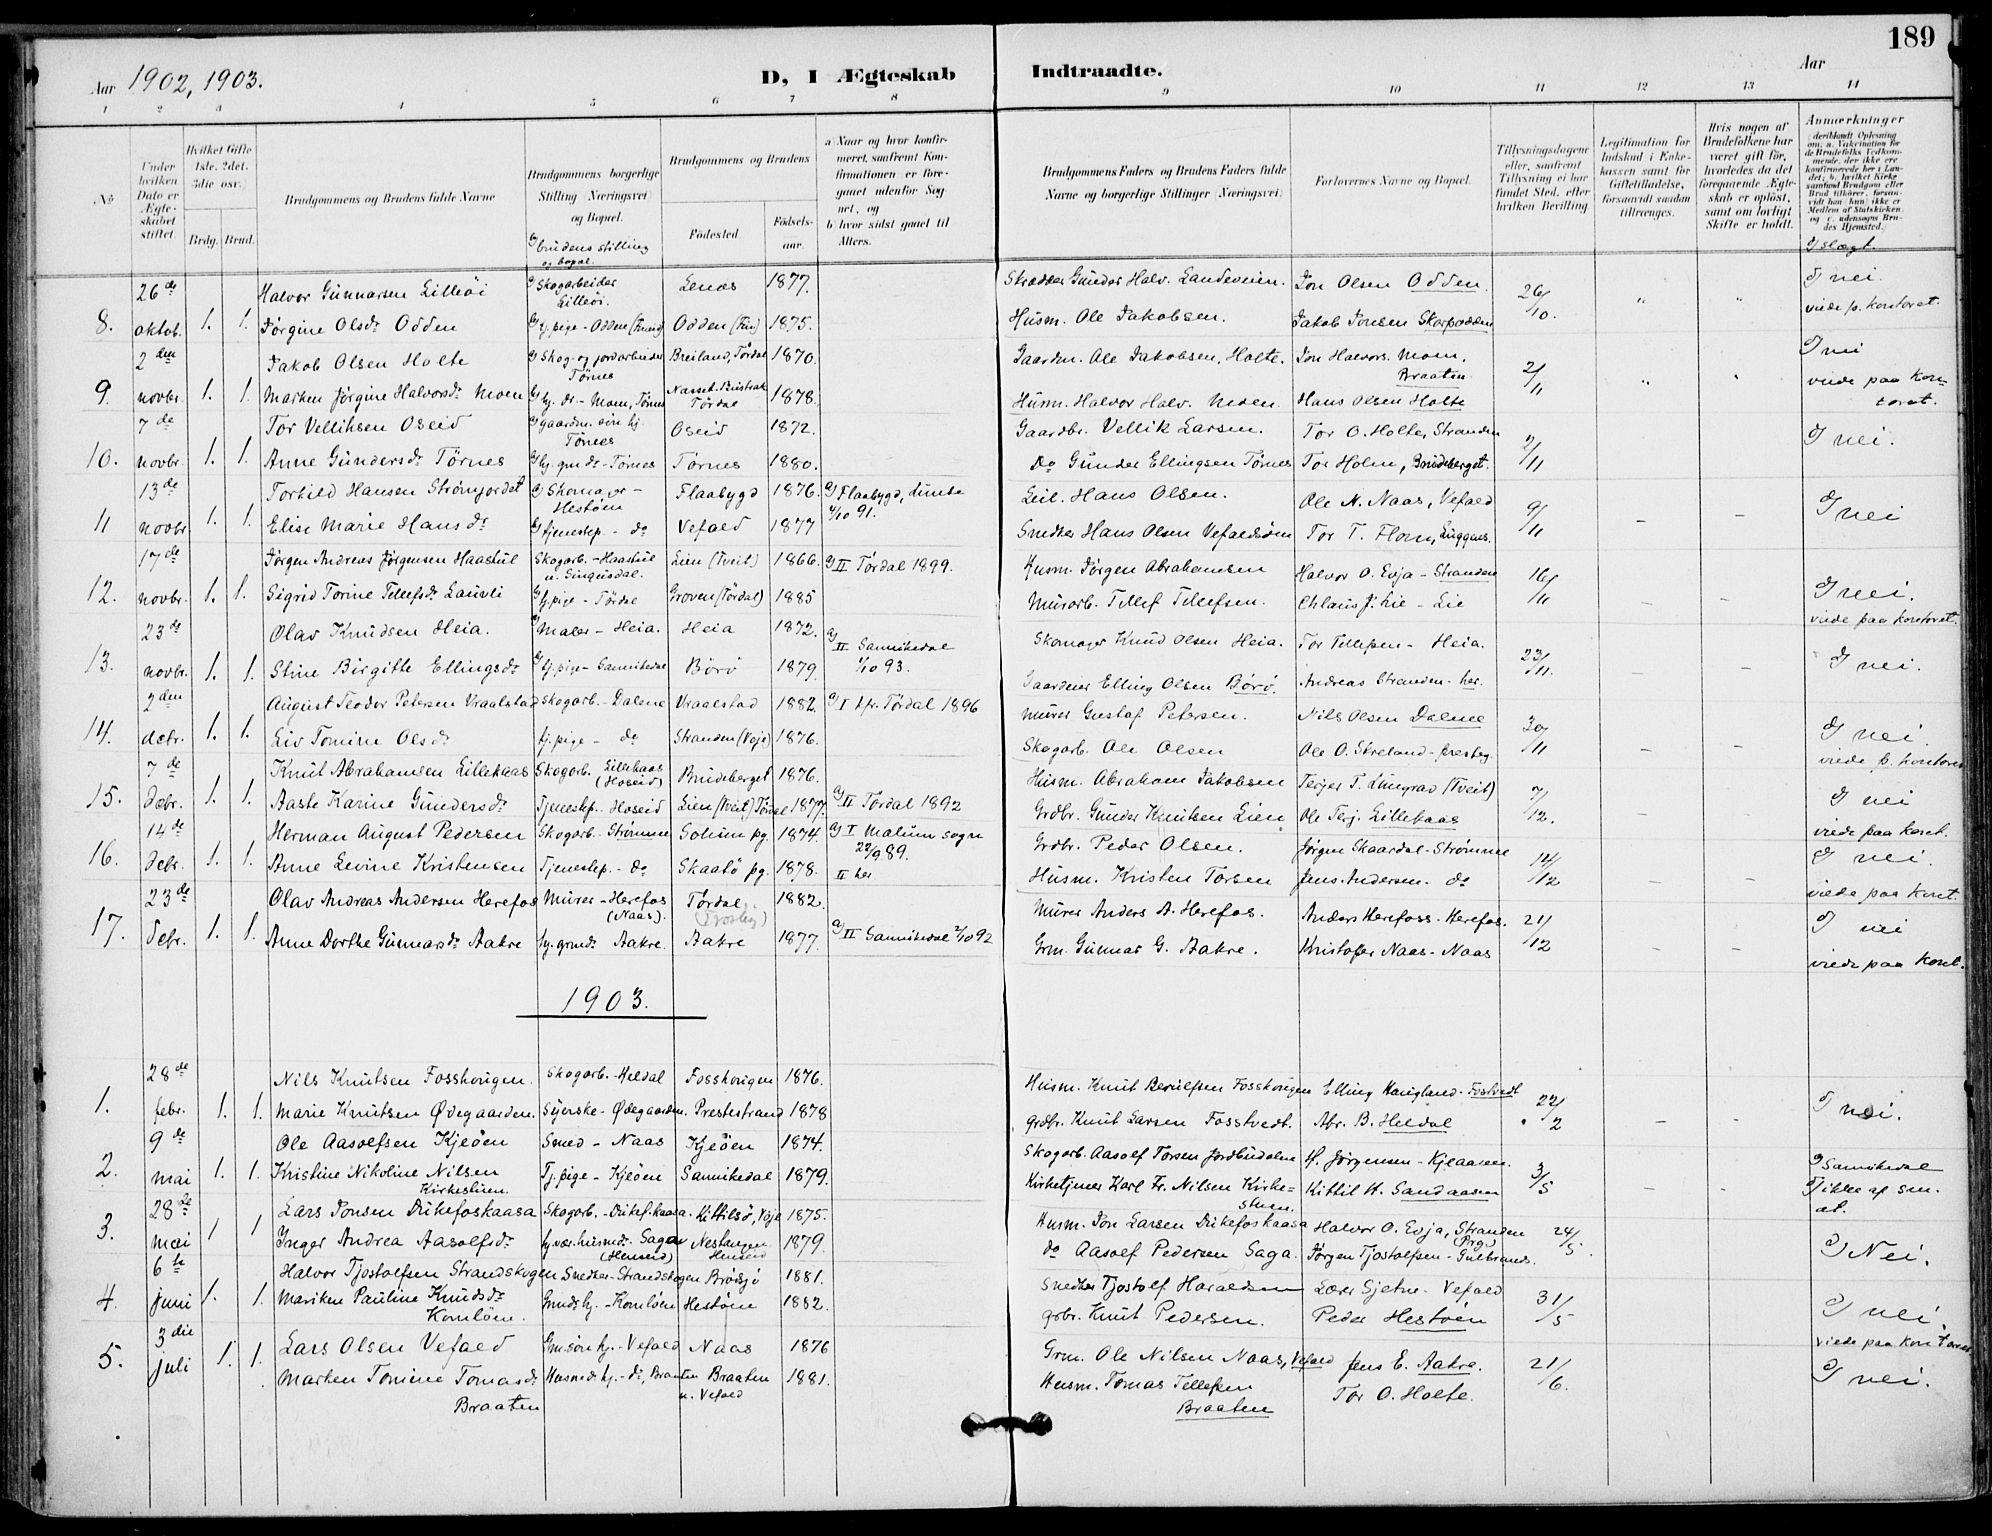 SAKO, Drangedal kirkebøker, F/Fa/L0012: Ministerialbok nr. 12, 1895-1905, s. 189